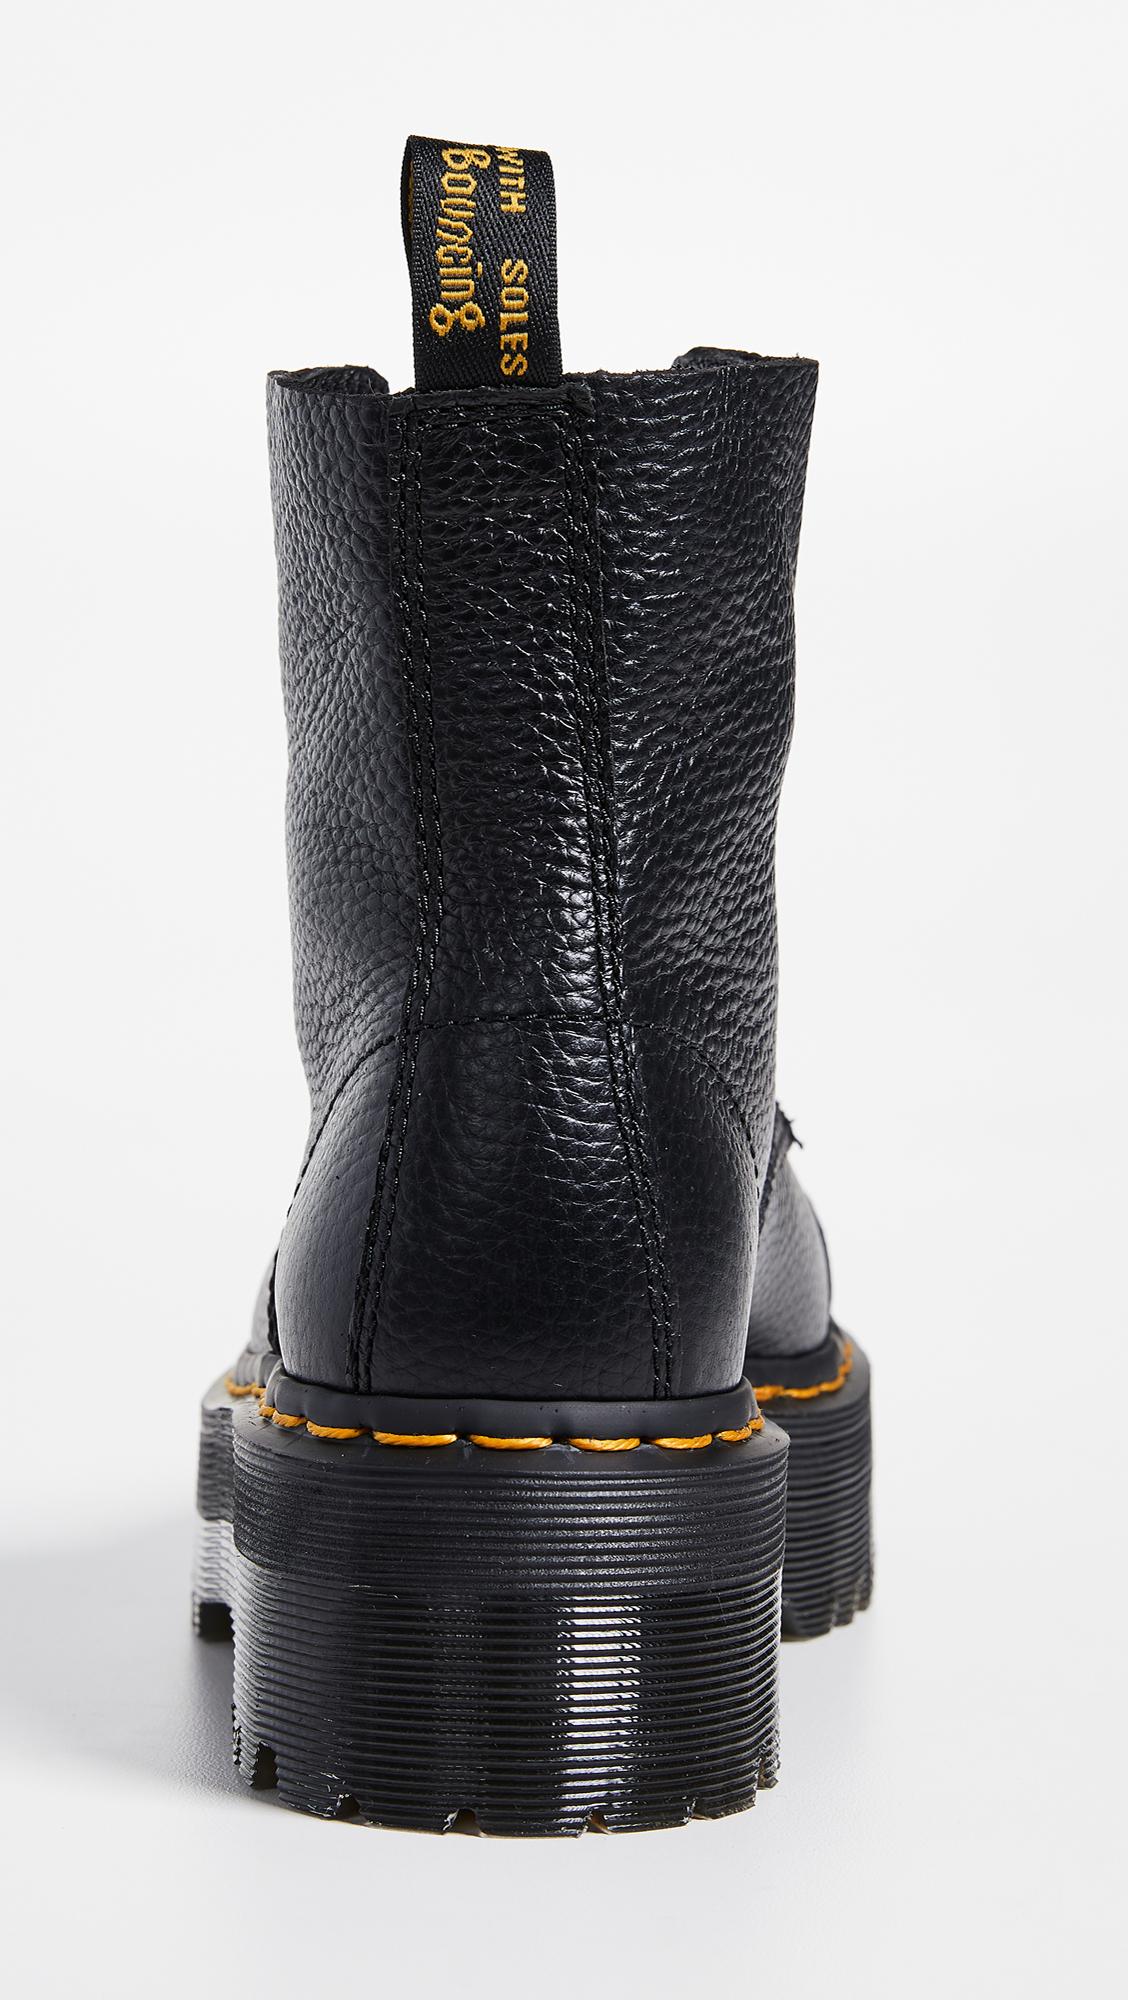 e90c8520a3d7 Dr. Martens Sinclair 8 Eye Boots